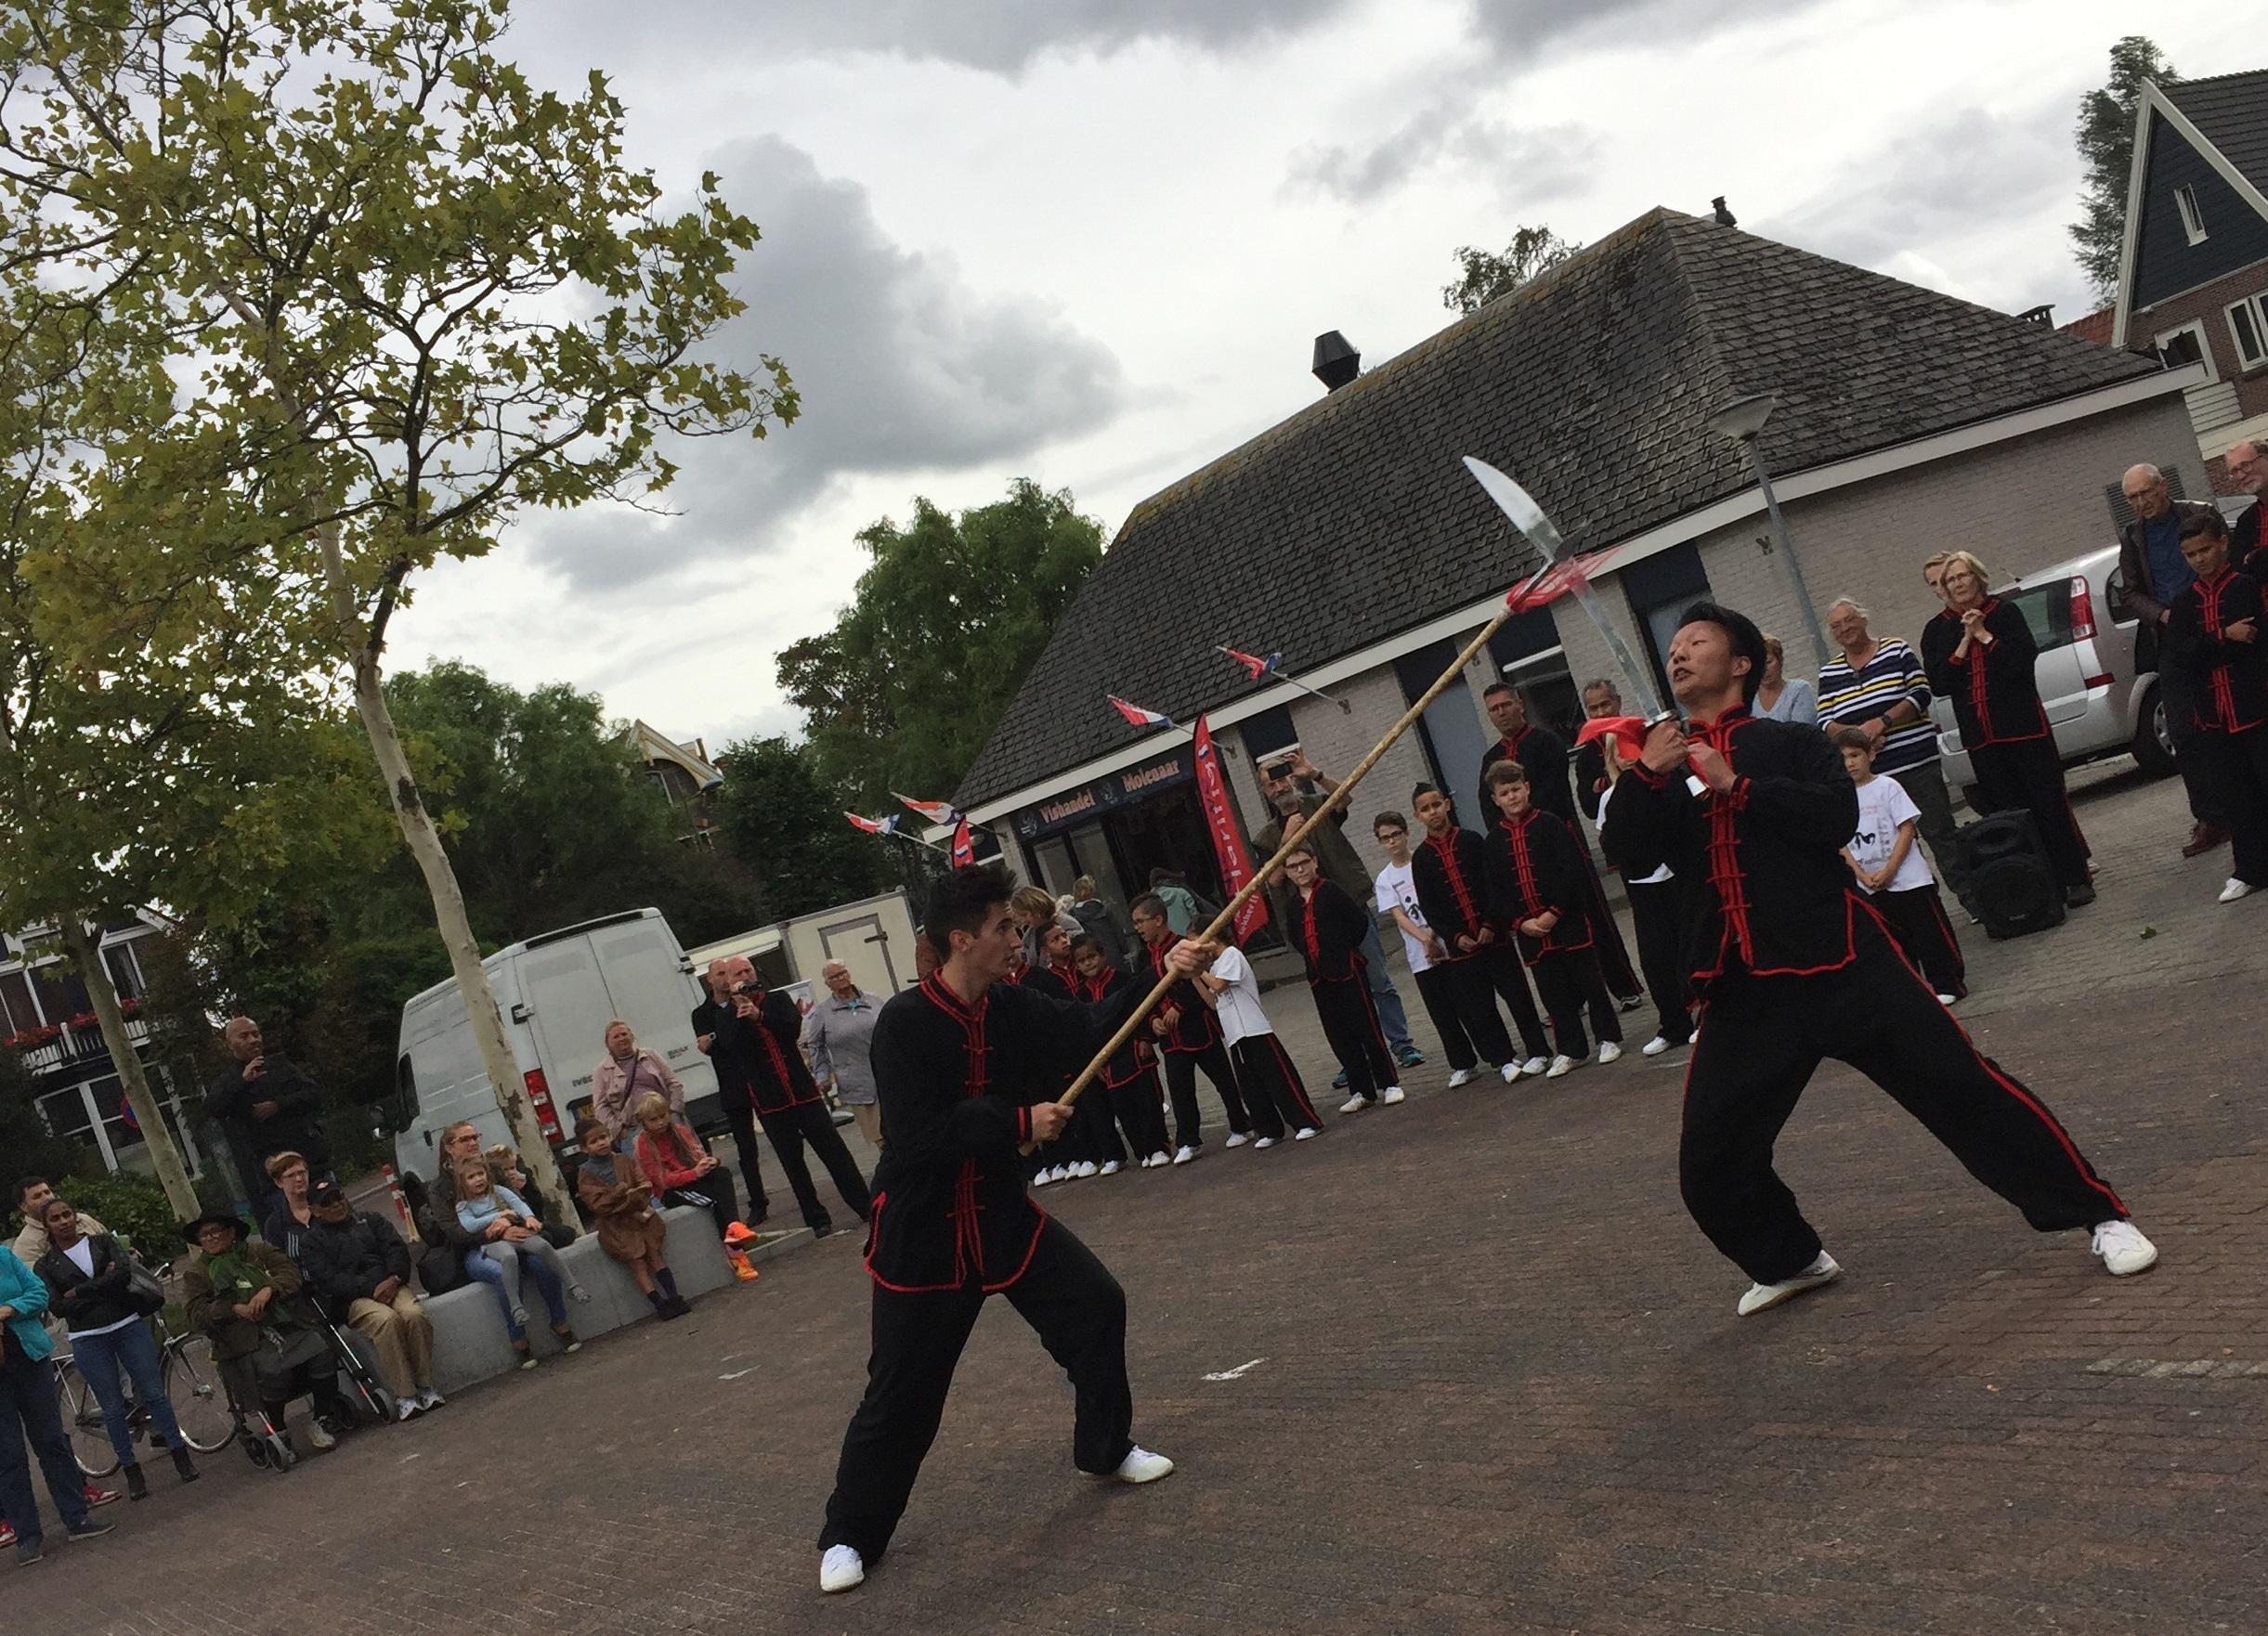 Kung fu-school Xin Yi gaf een demonstratie. (Foto: Kung fu-school Xin Yi)